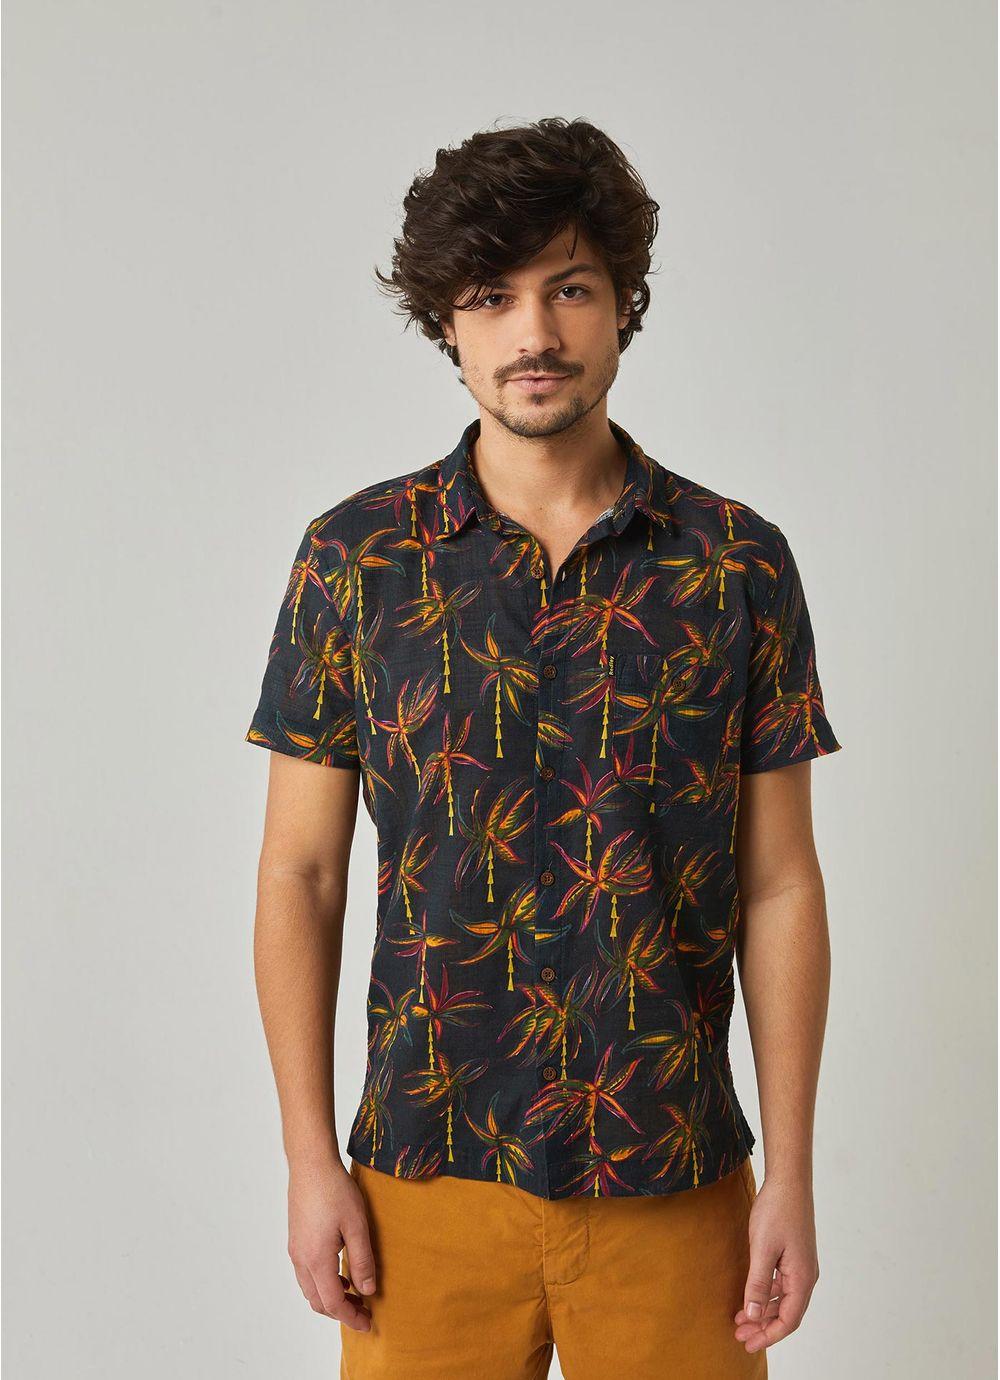 a69bc2291ab Camisa manga curta estampada coqueiral PRETO - redley